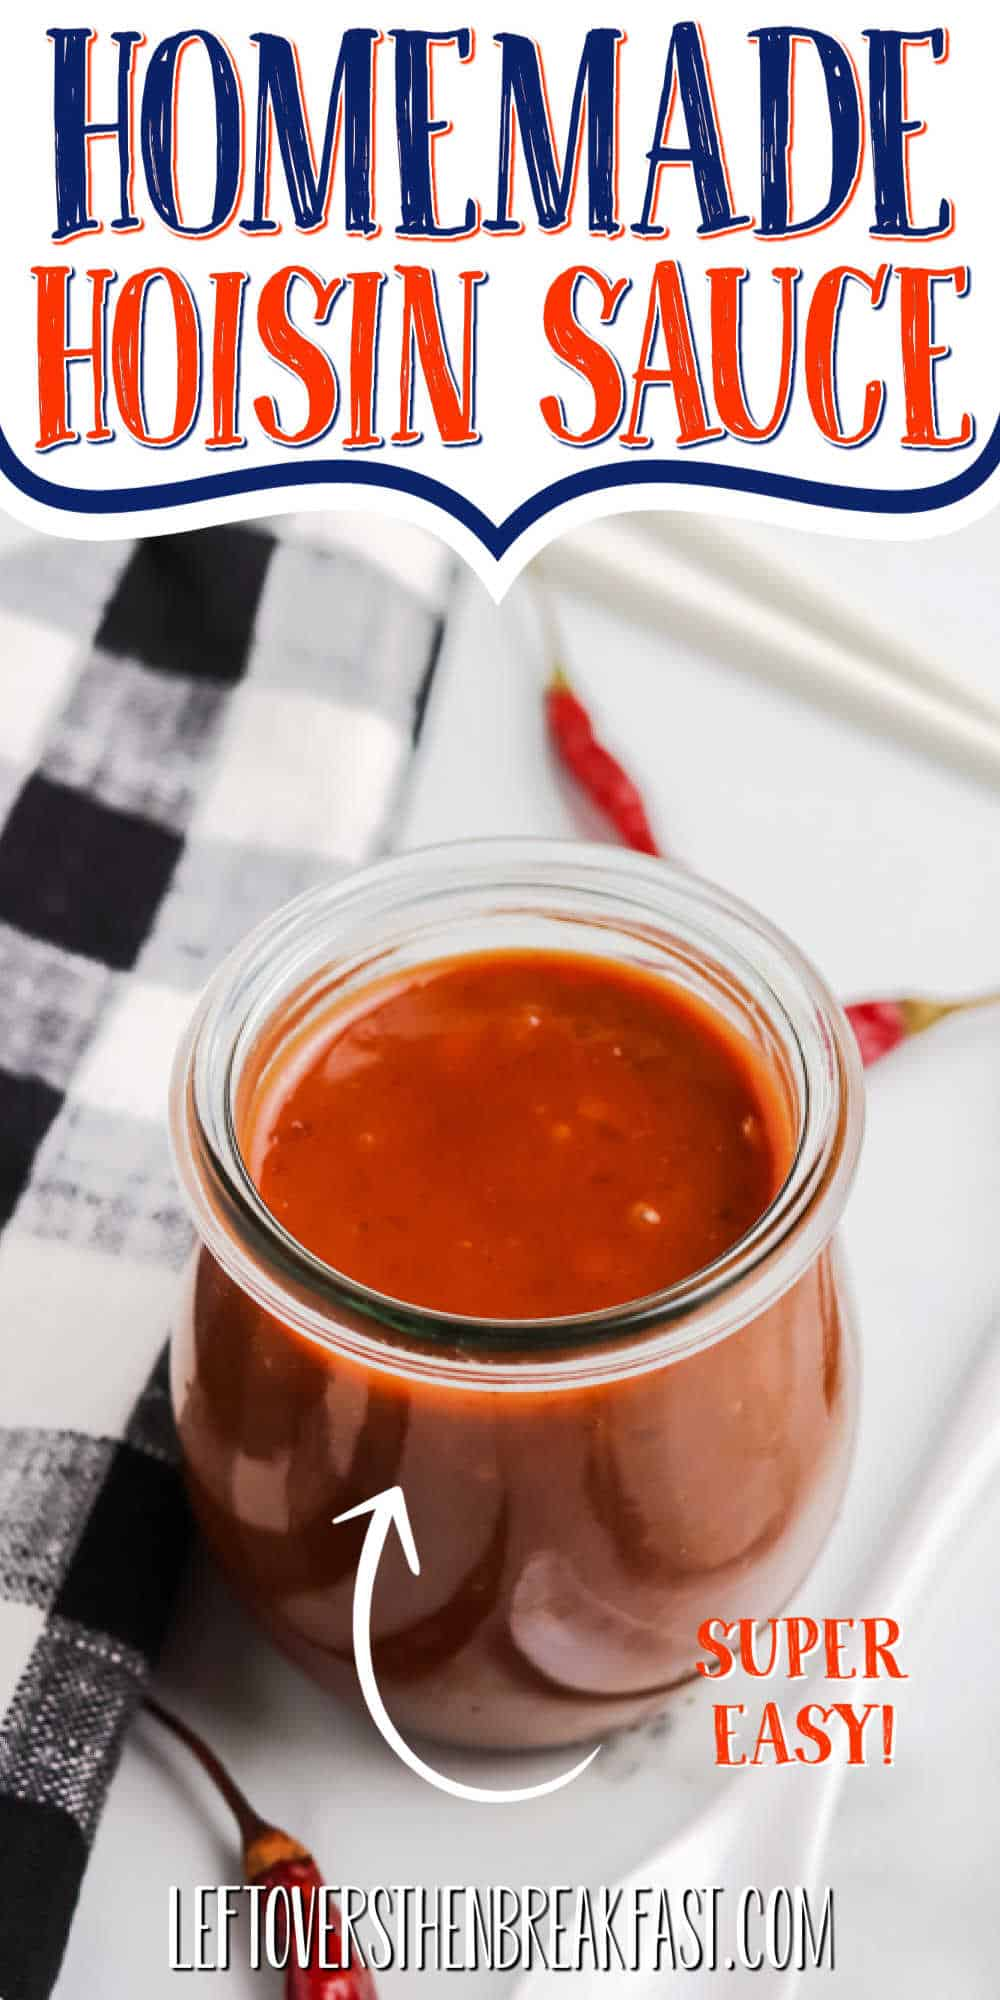 "jar of sauce with text ""homemade hoisin sauce"""